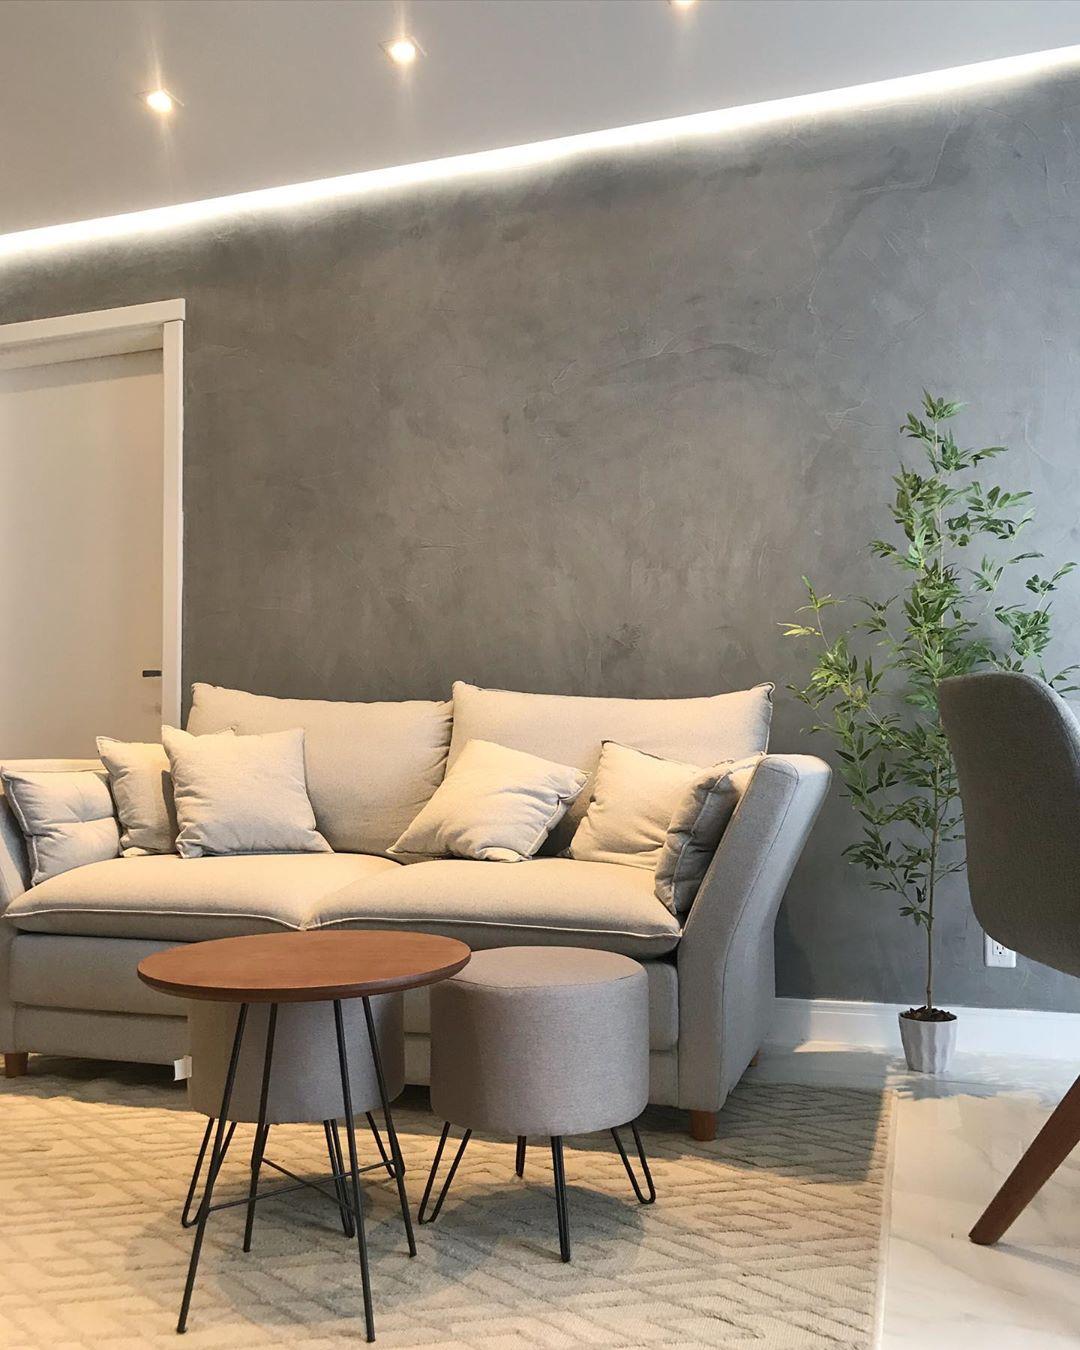 sofa cinza e parede de cimento queimado